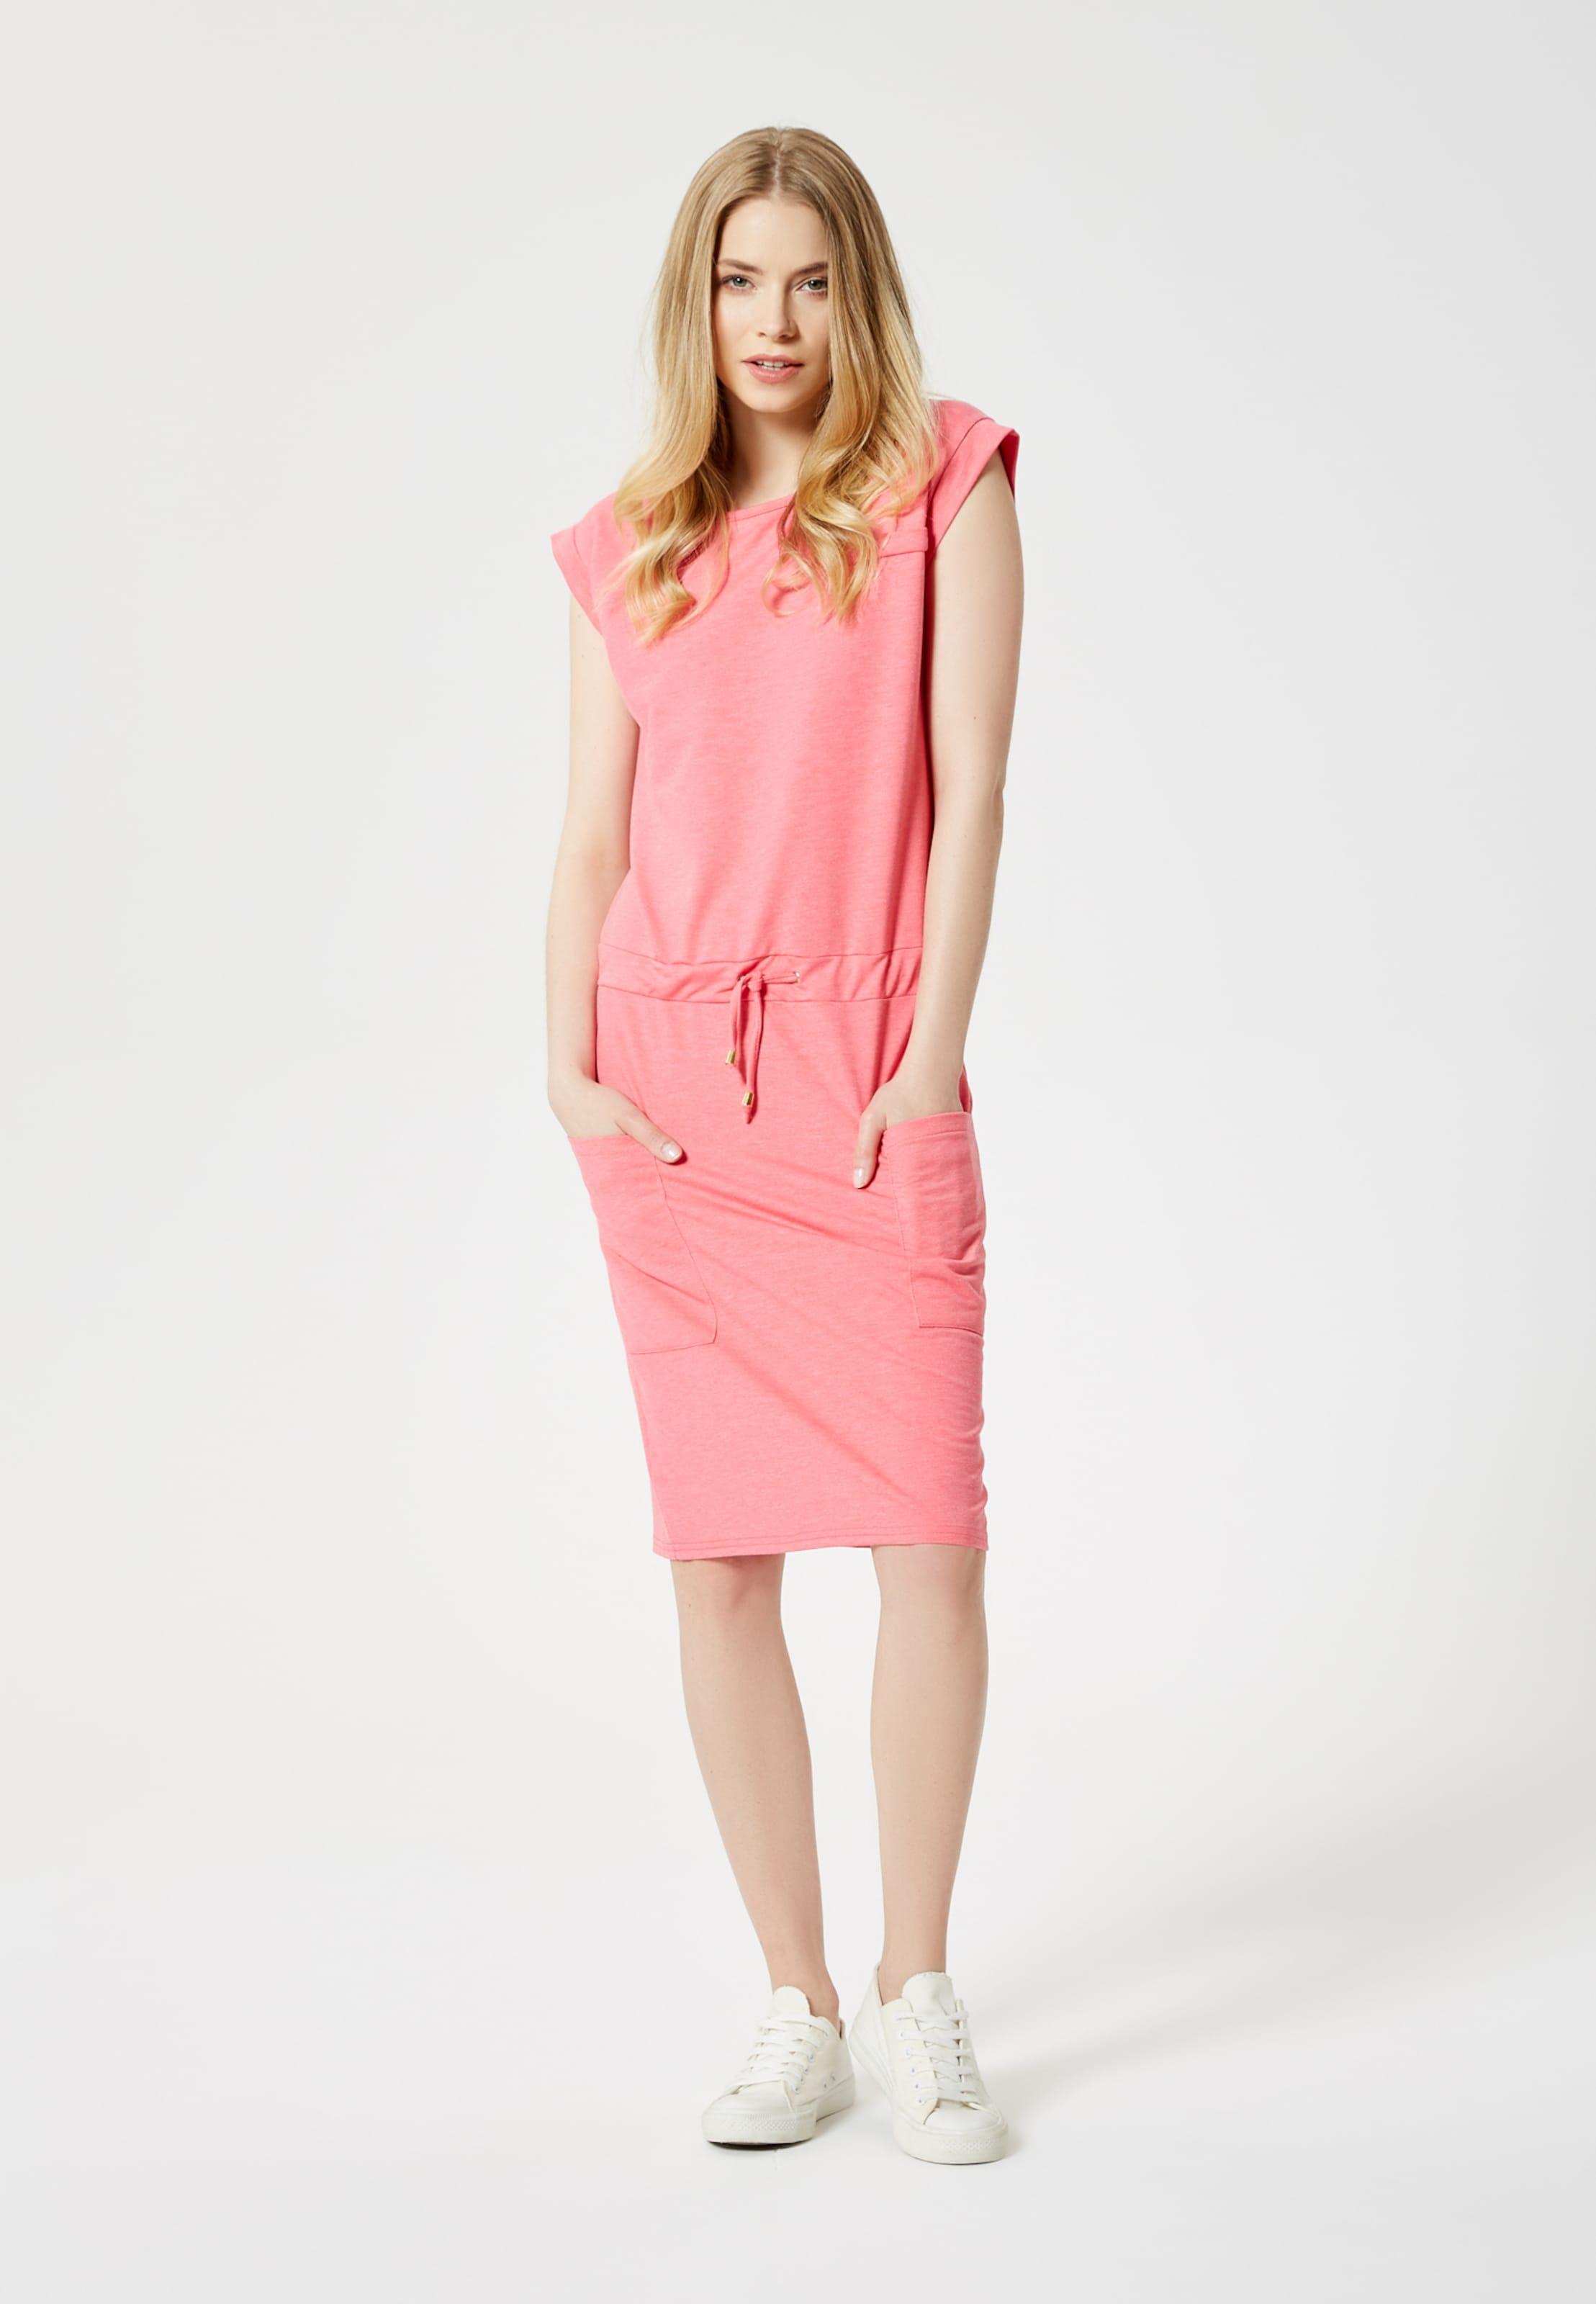 Kleid Usha In Usha Kleid Pink In Pink Kleid Usha In Pink Kleid Usha mv08Nnw